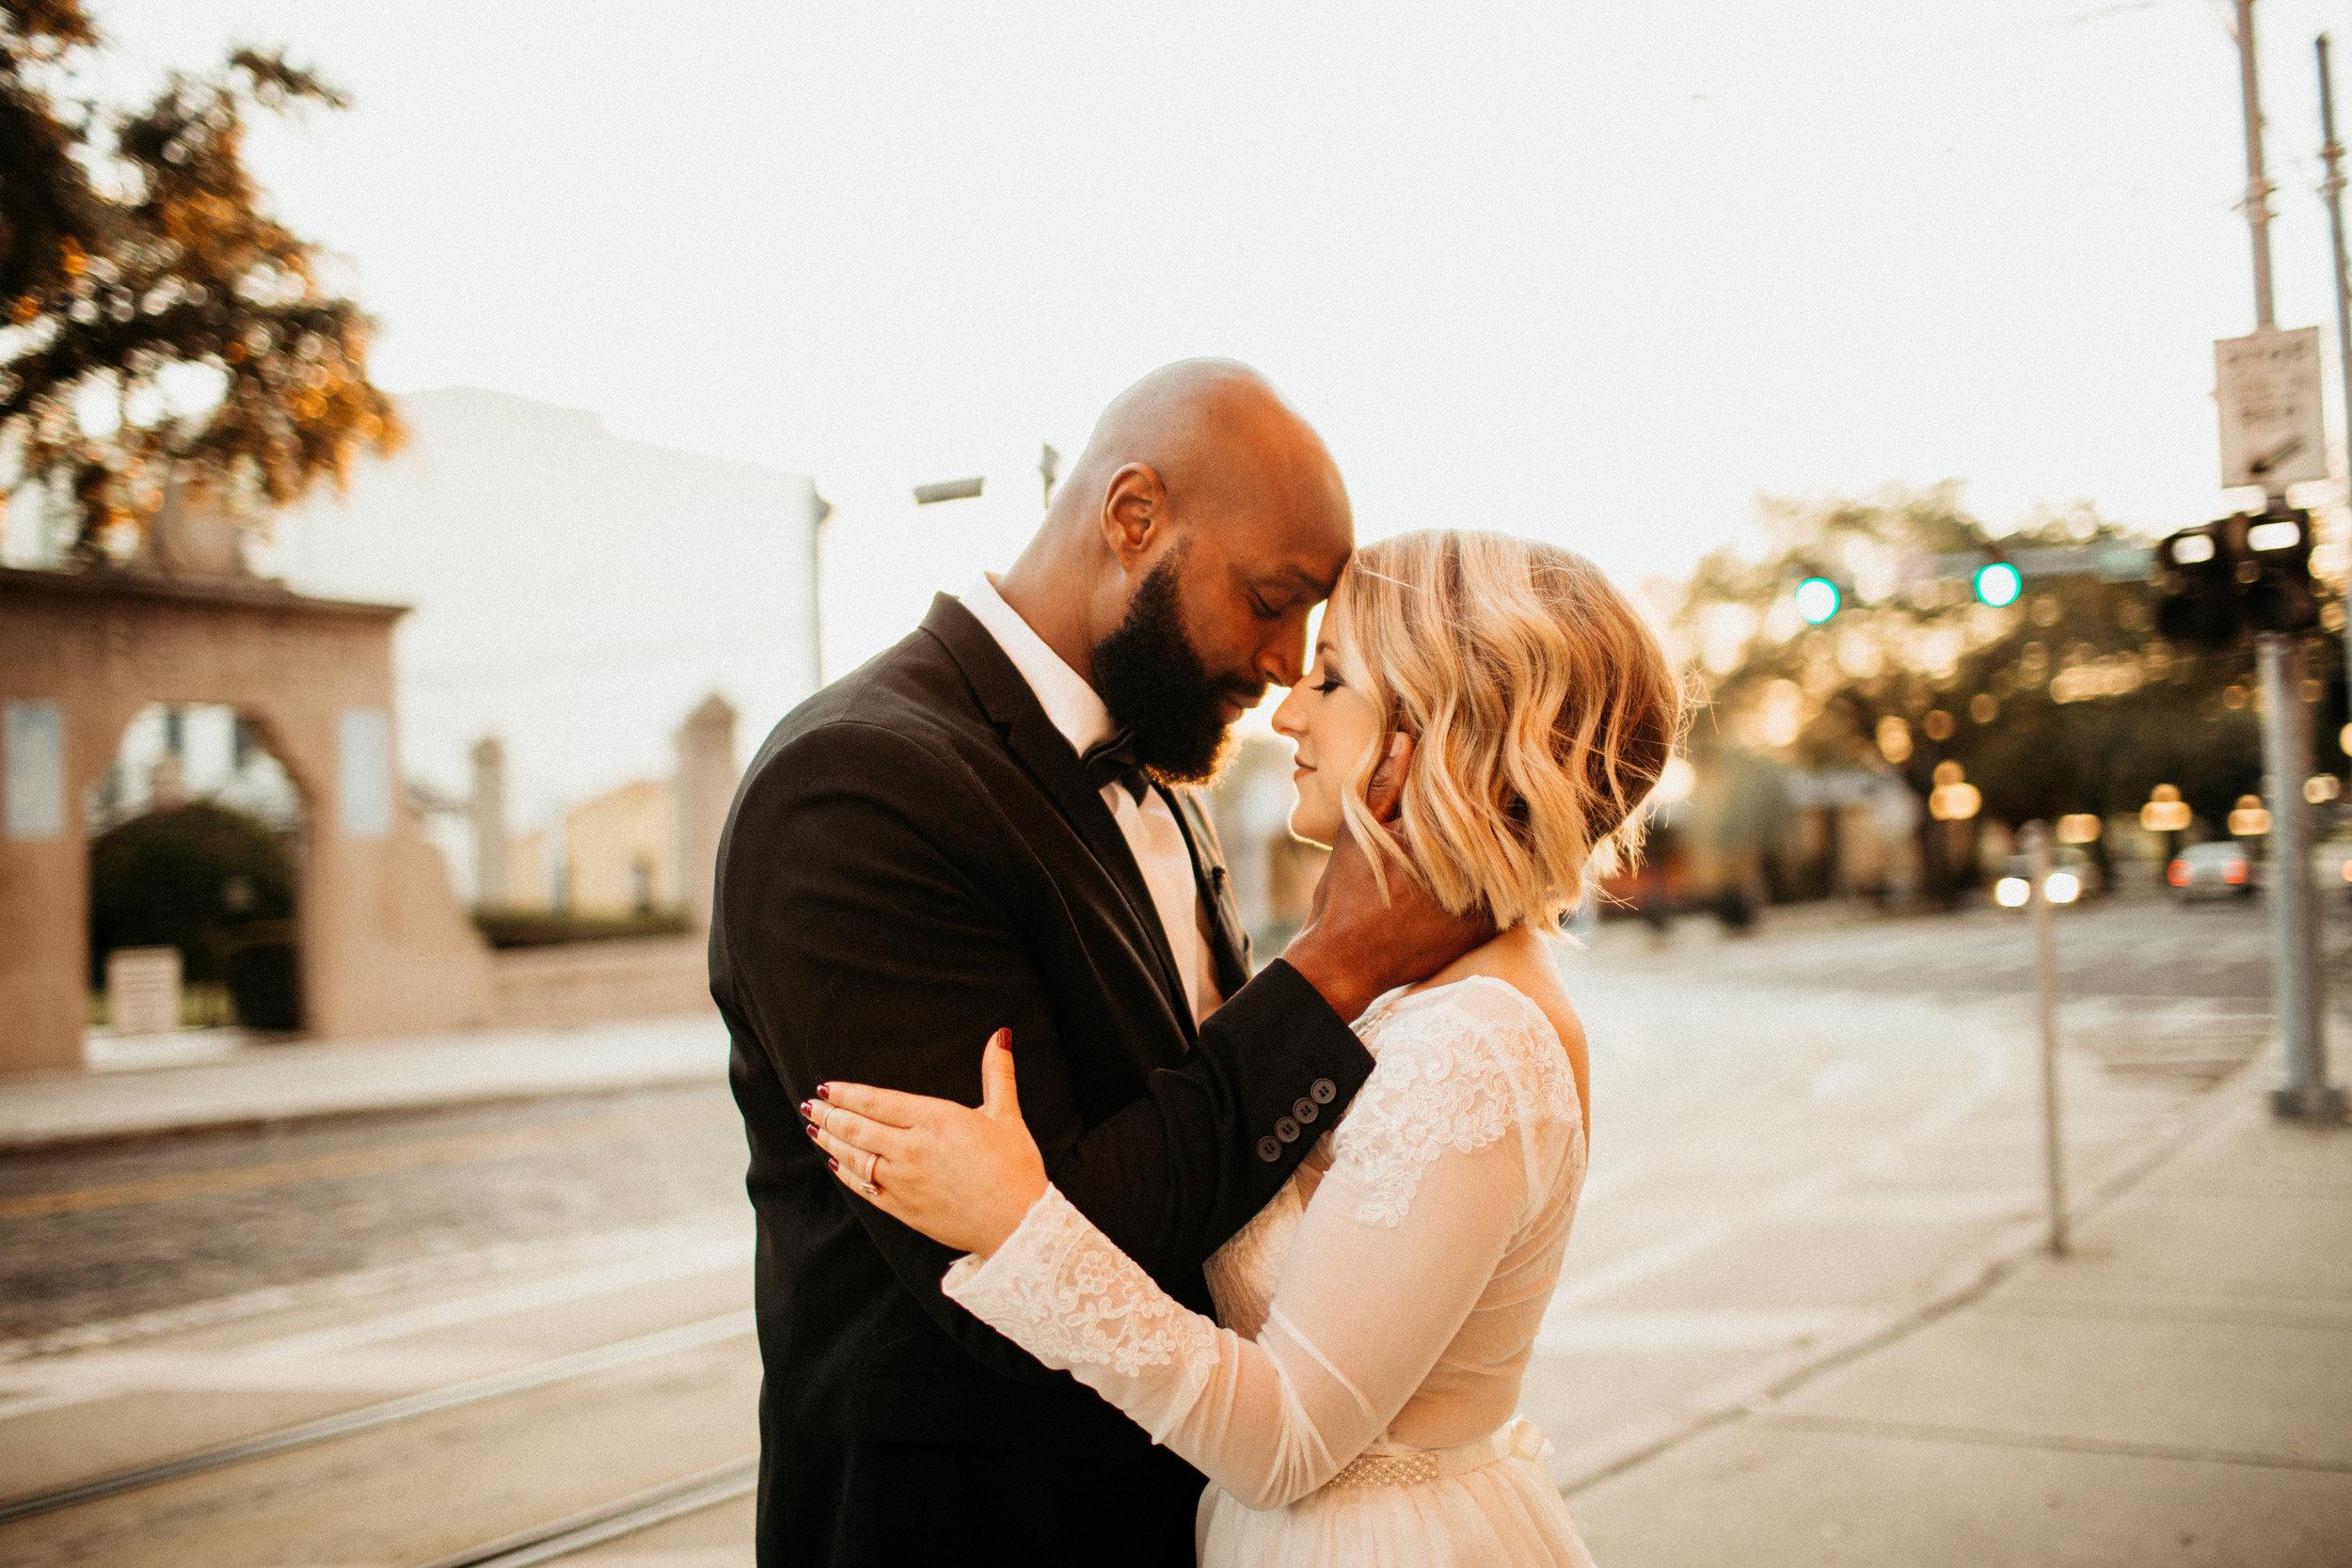 Craig + Sam | Tampa | Intimate Wedding